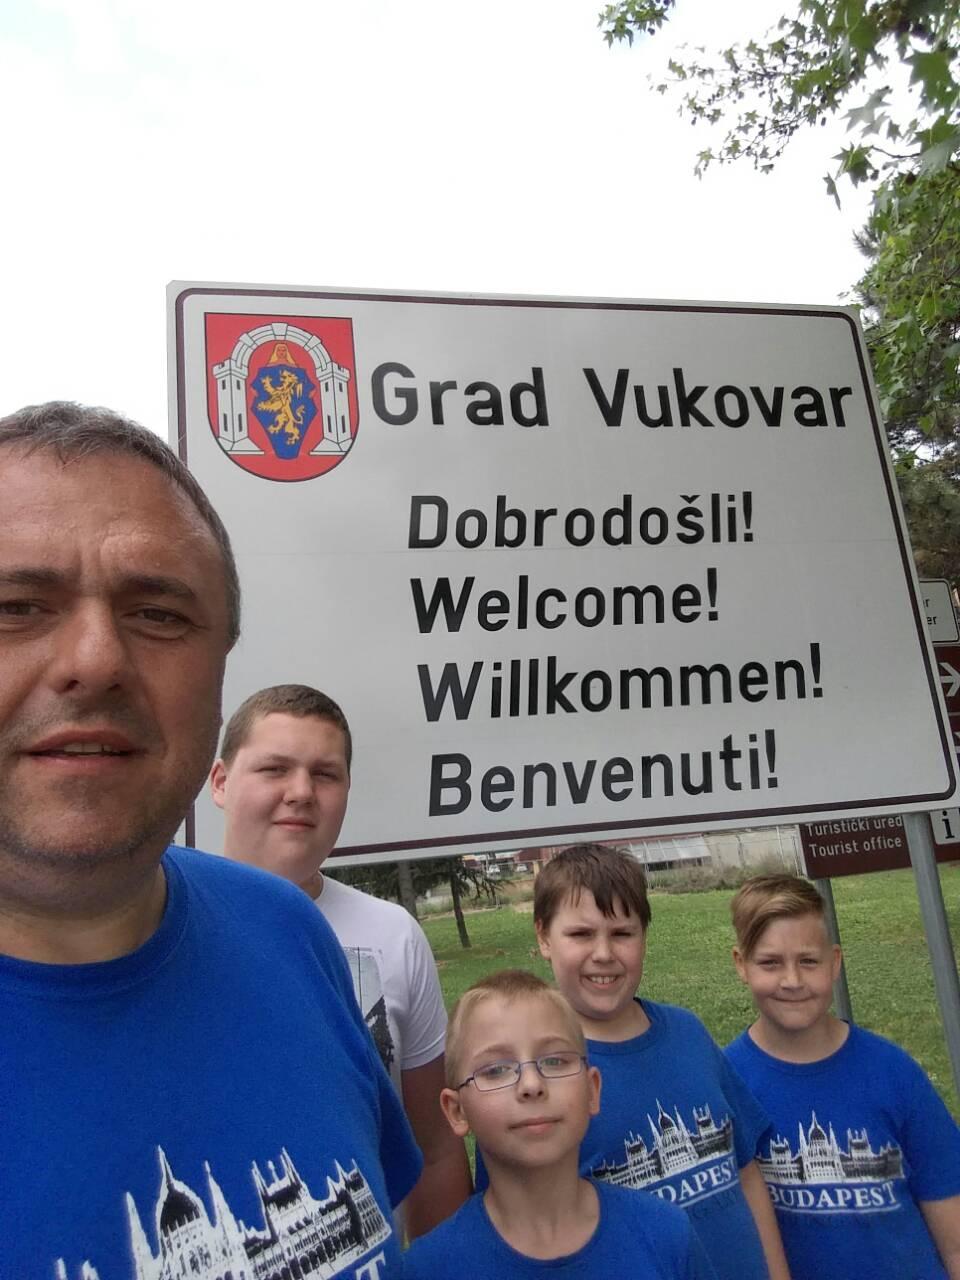 Vukuvar_welcome_20180505